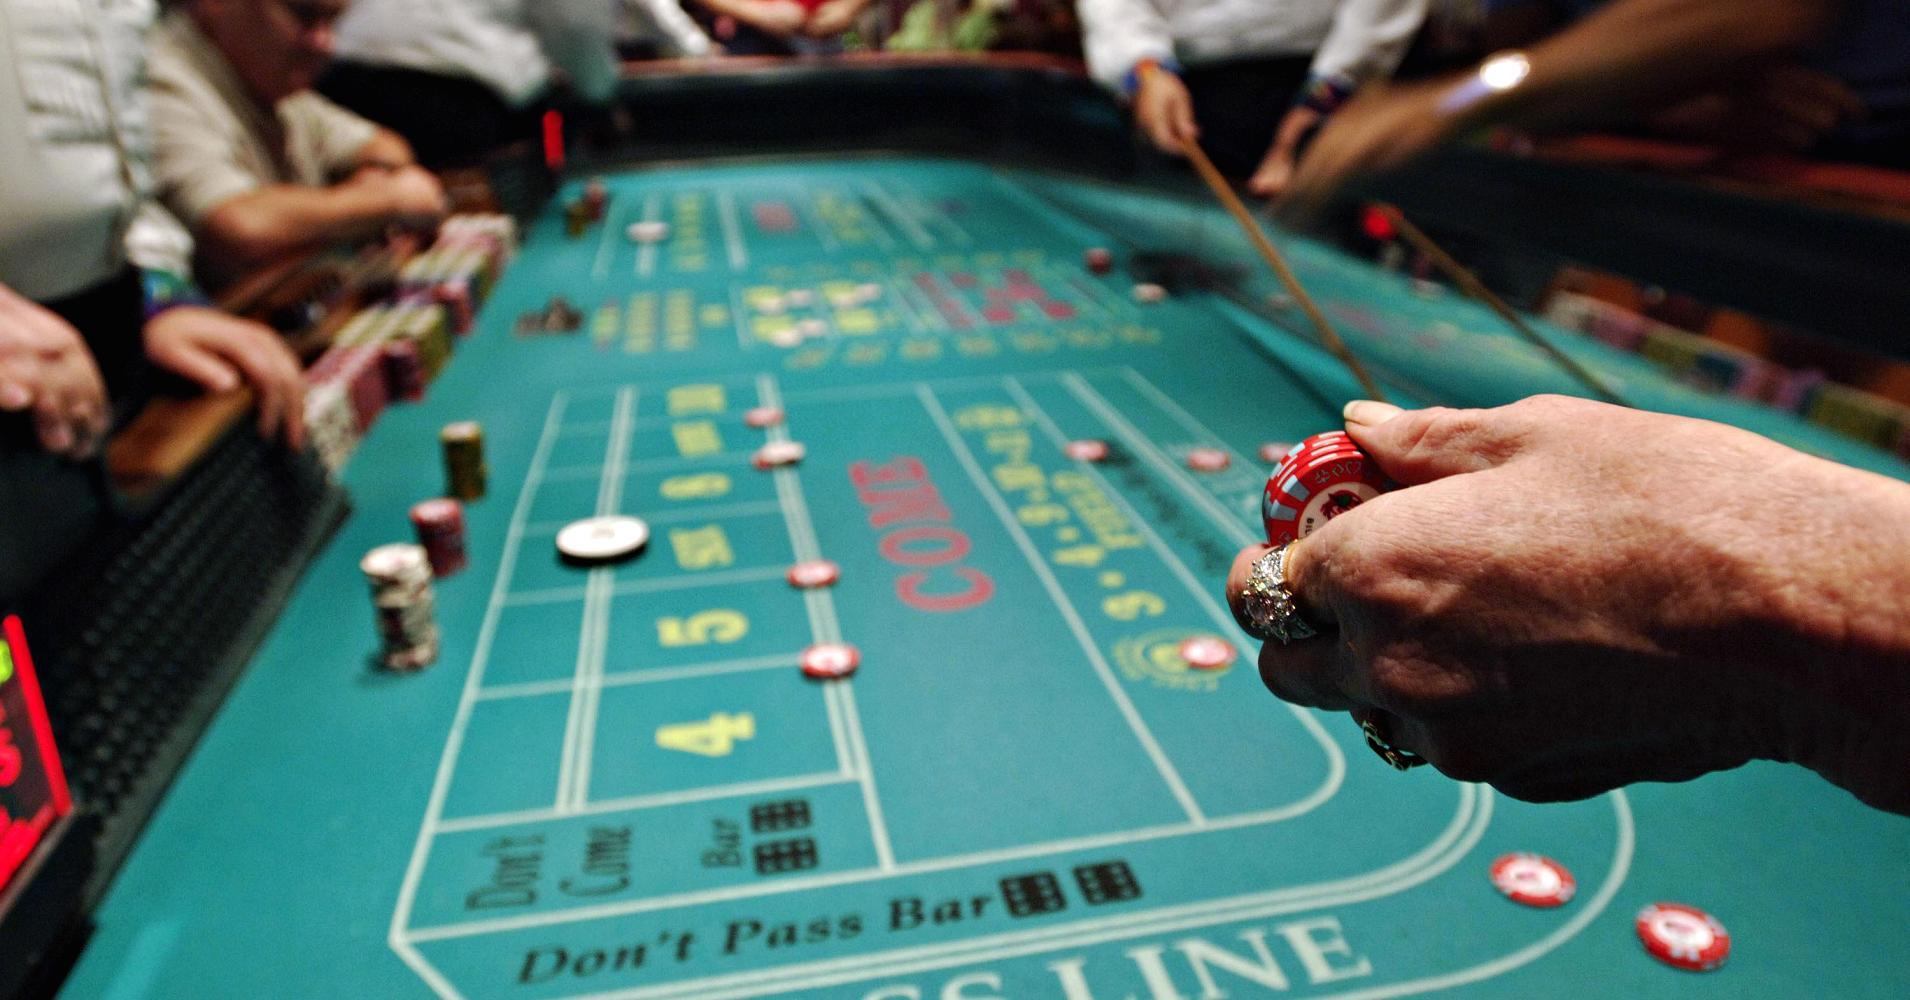 21 blackjack how to win